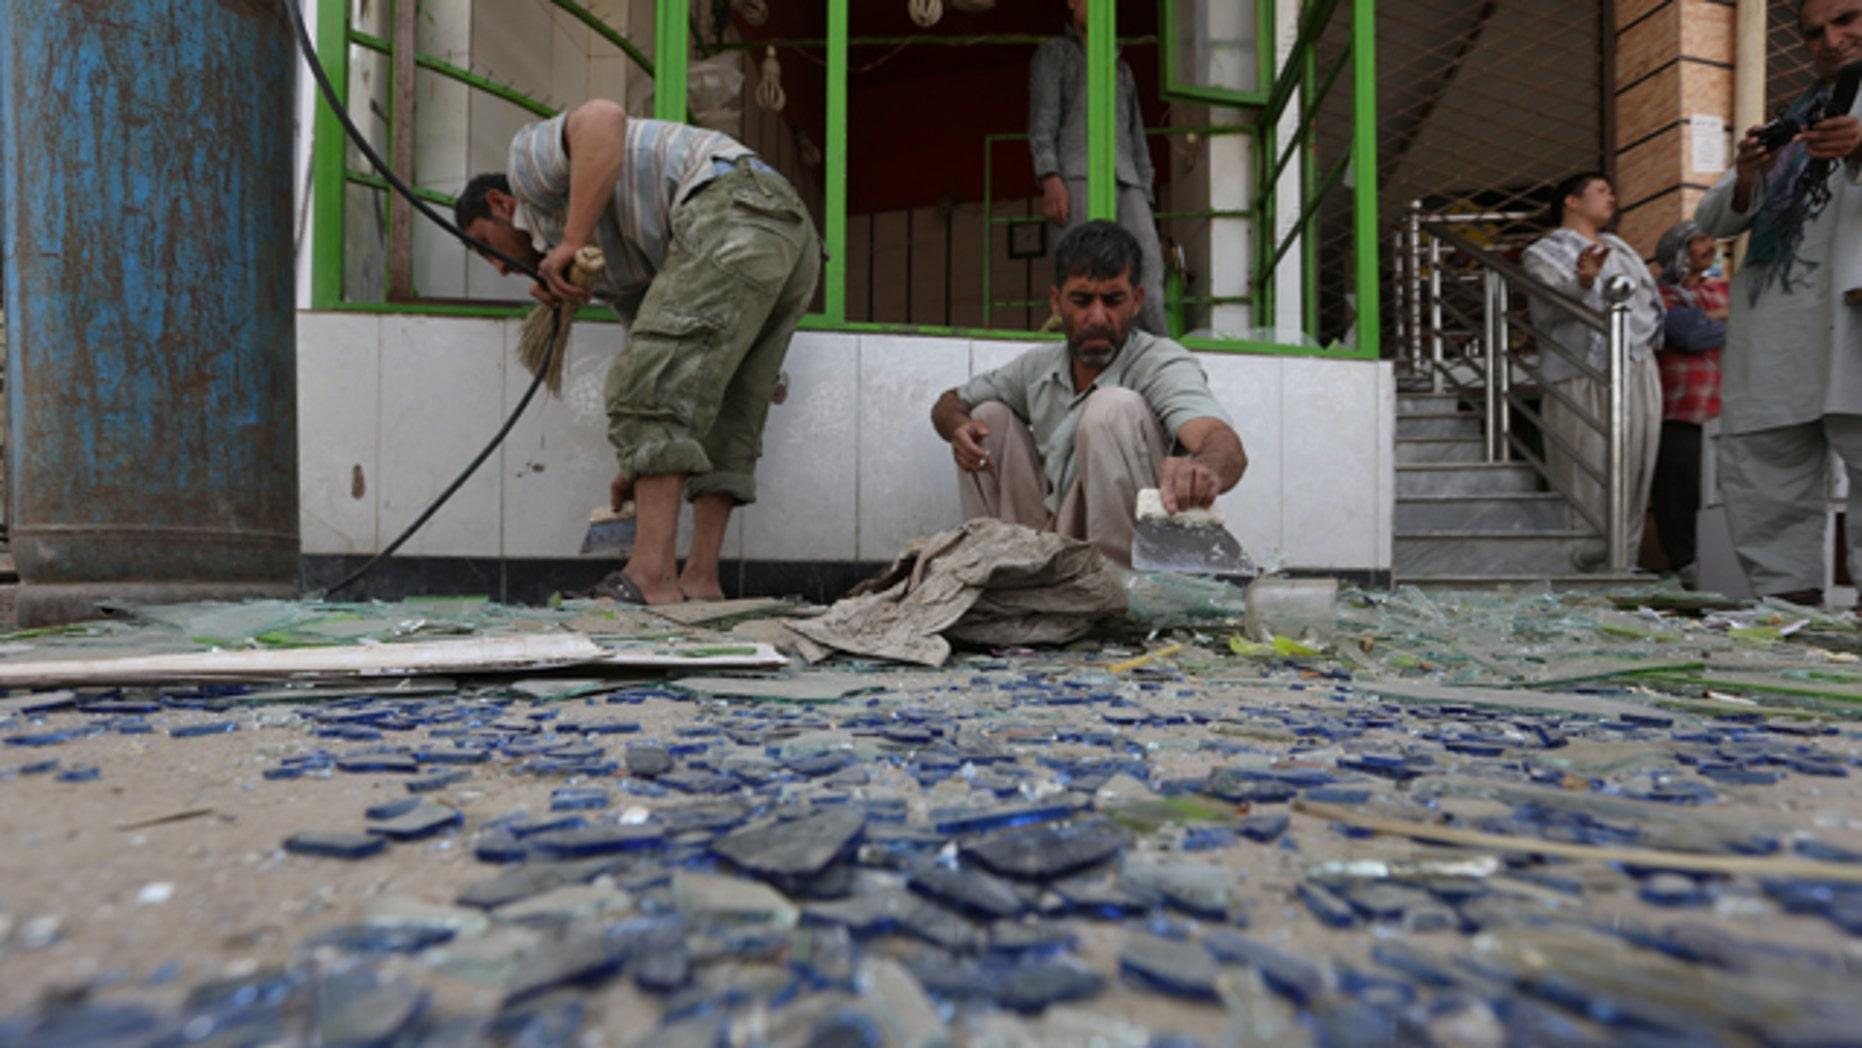 Afghanistan suicide bombing targets NATO convoy, kills 4